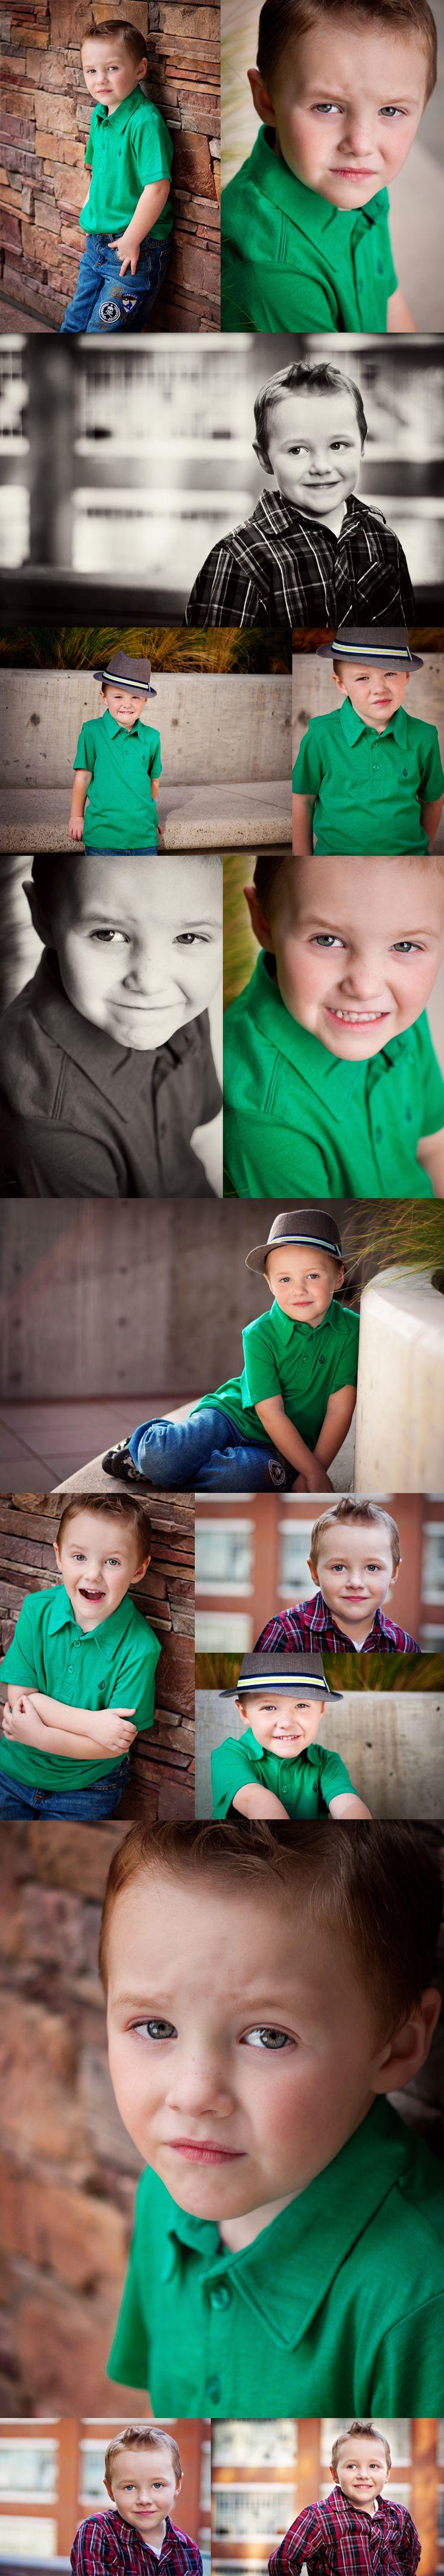 Child Portrait Session, #photography, #poses, #kids